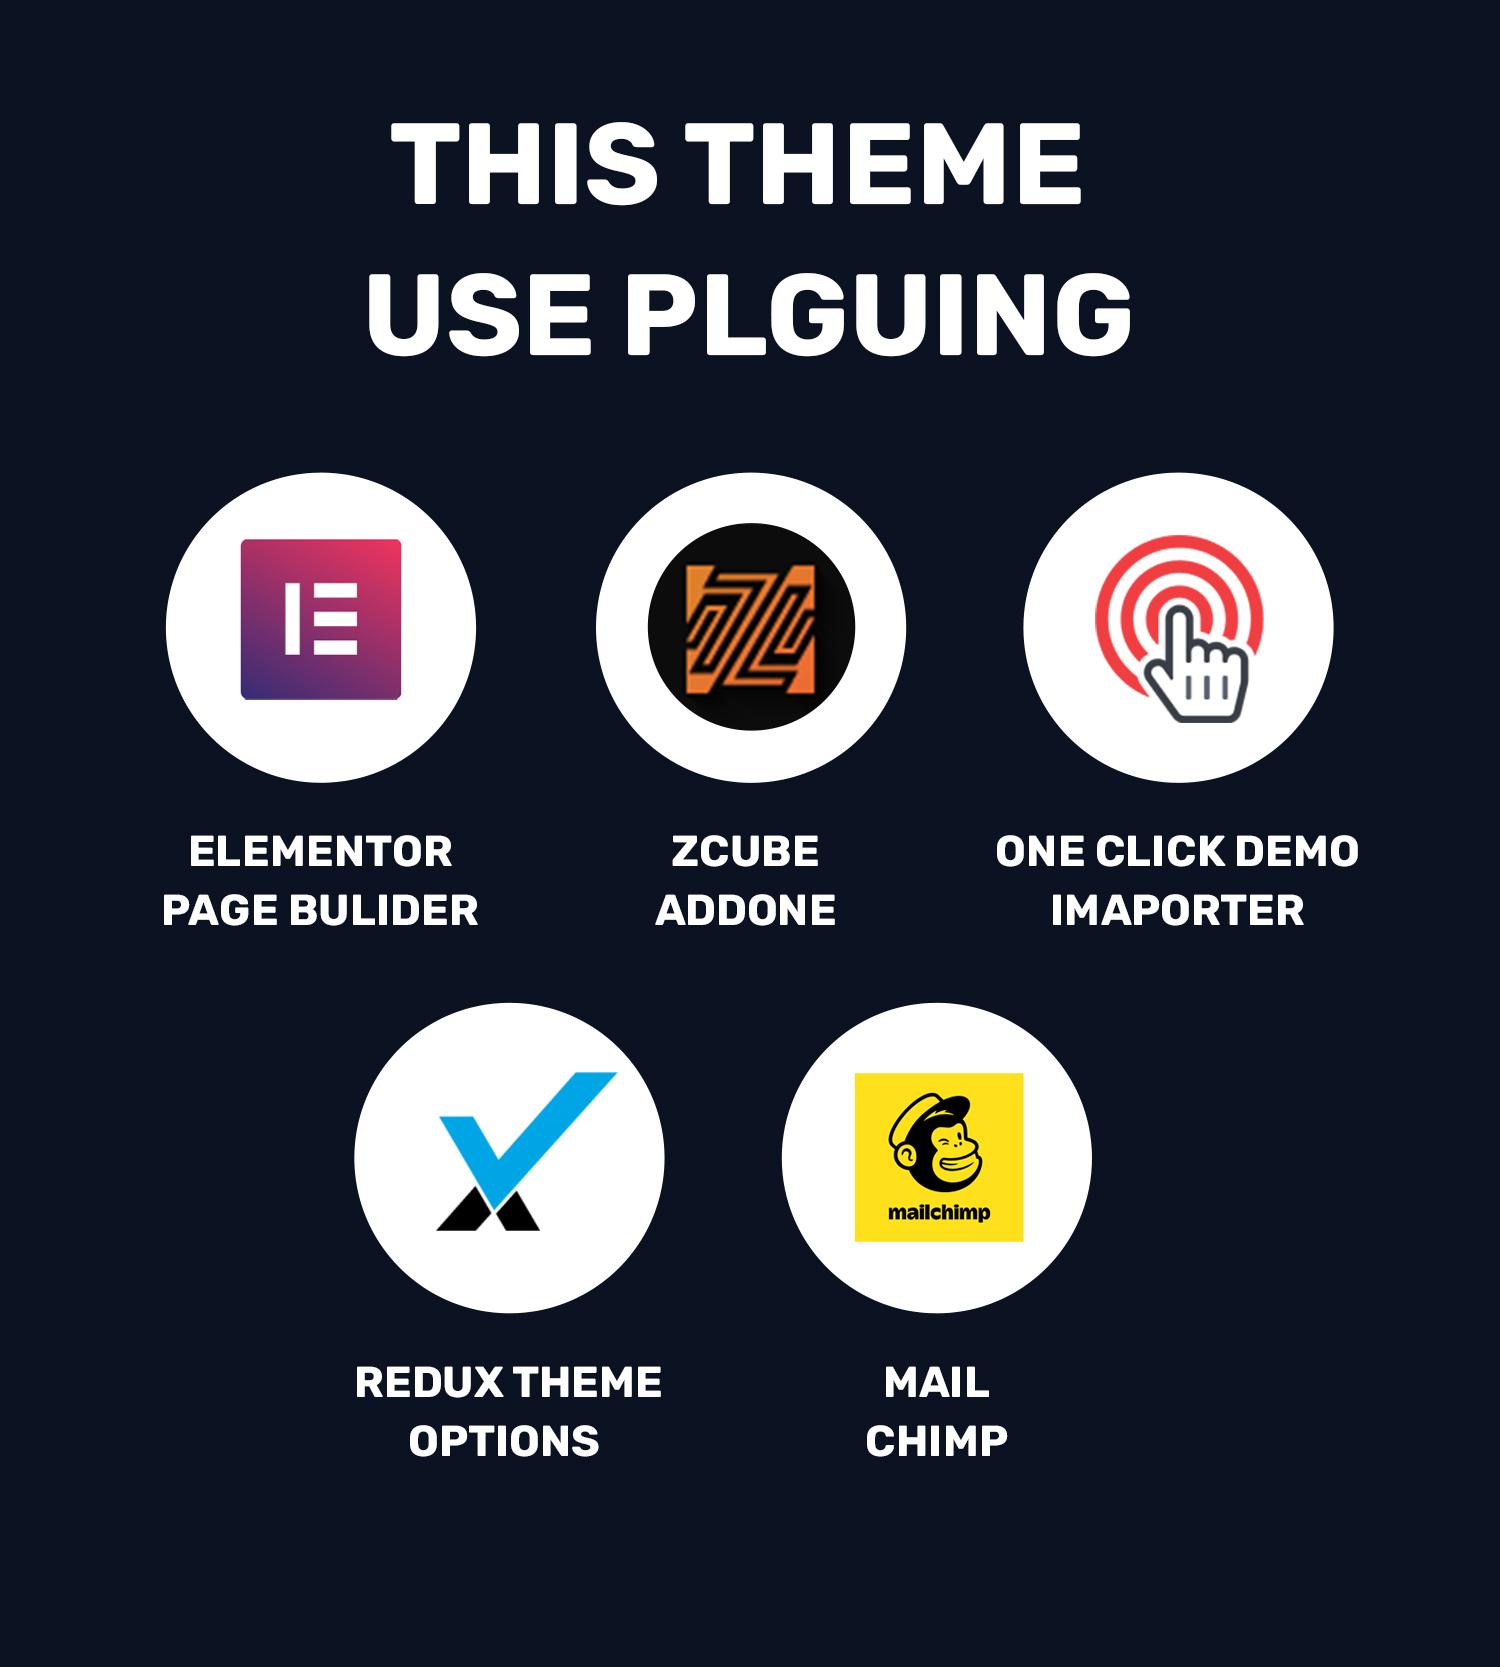 http://wordpress.zcube.in/newpress/theme-docs/assets/plugin-dis.jpg